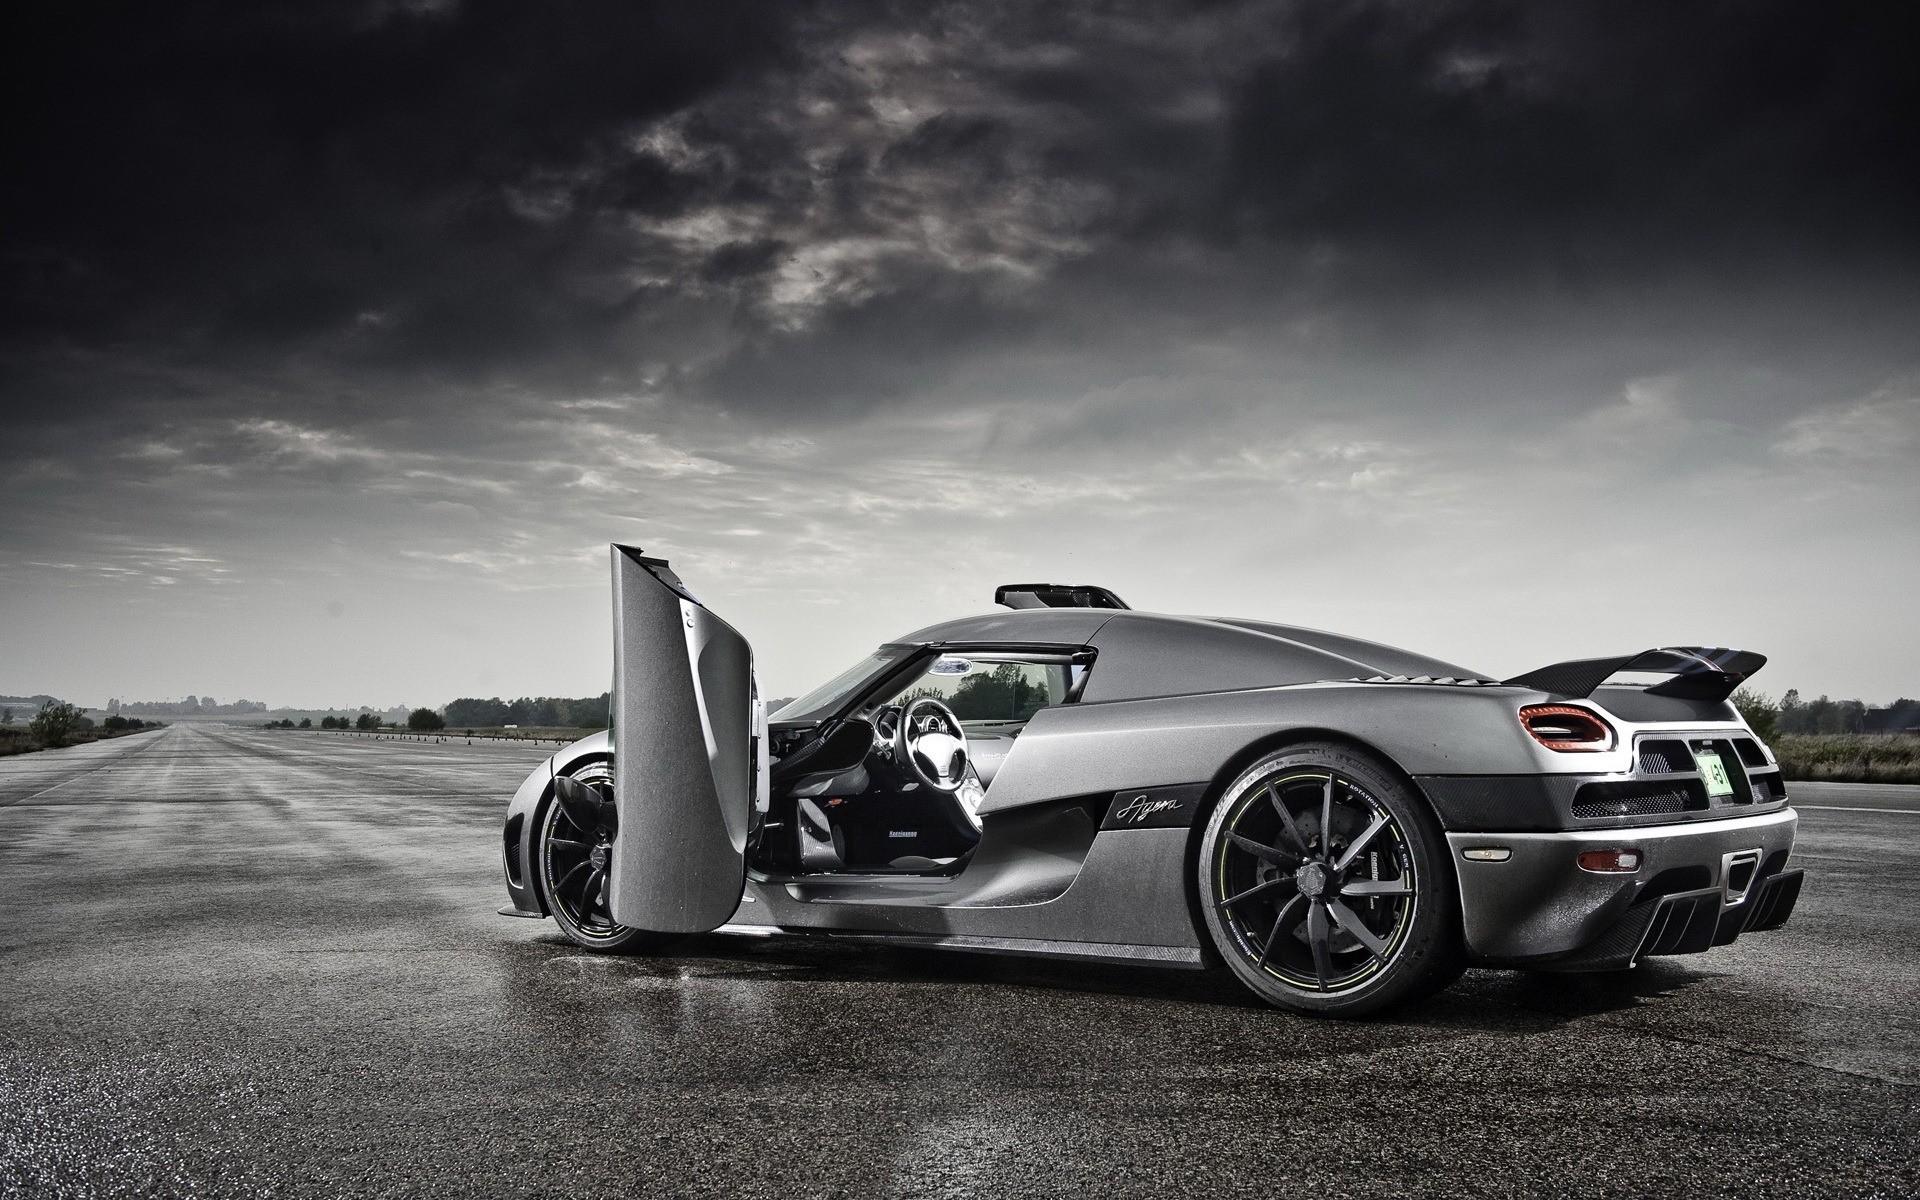 Koenigsegg HD Wallpaper | Background Image | 1920x1200 ...